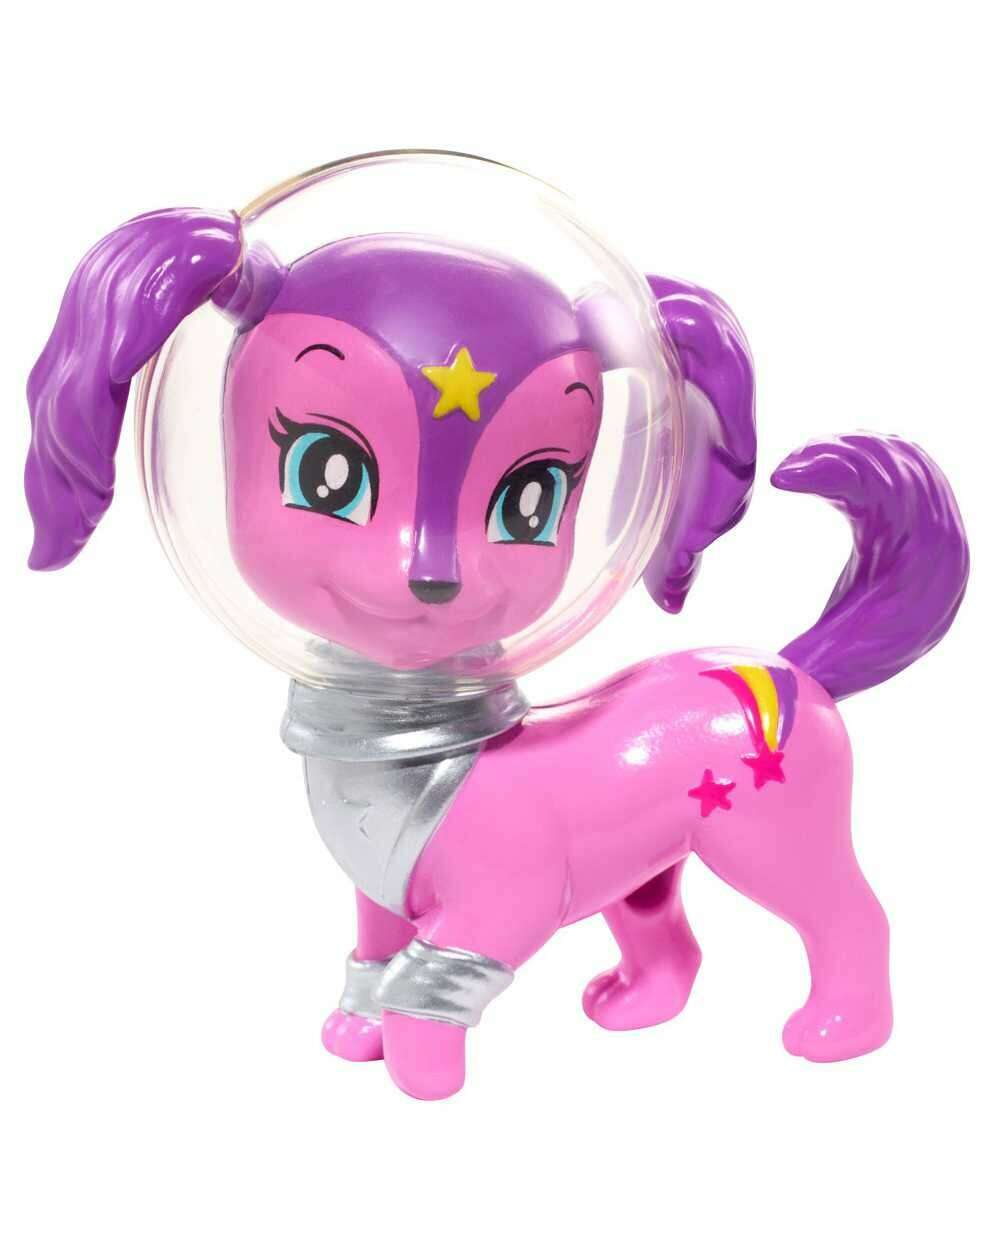 "Питомец Barbie DLT54 ""Космический питомец"""